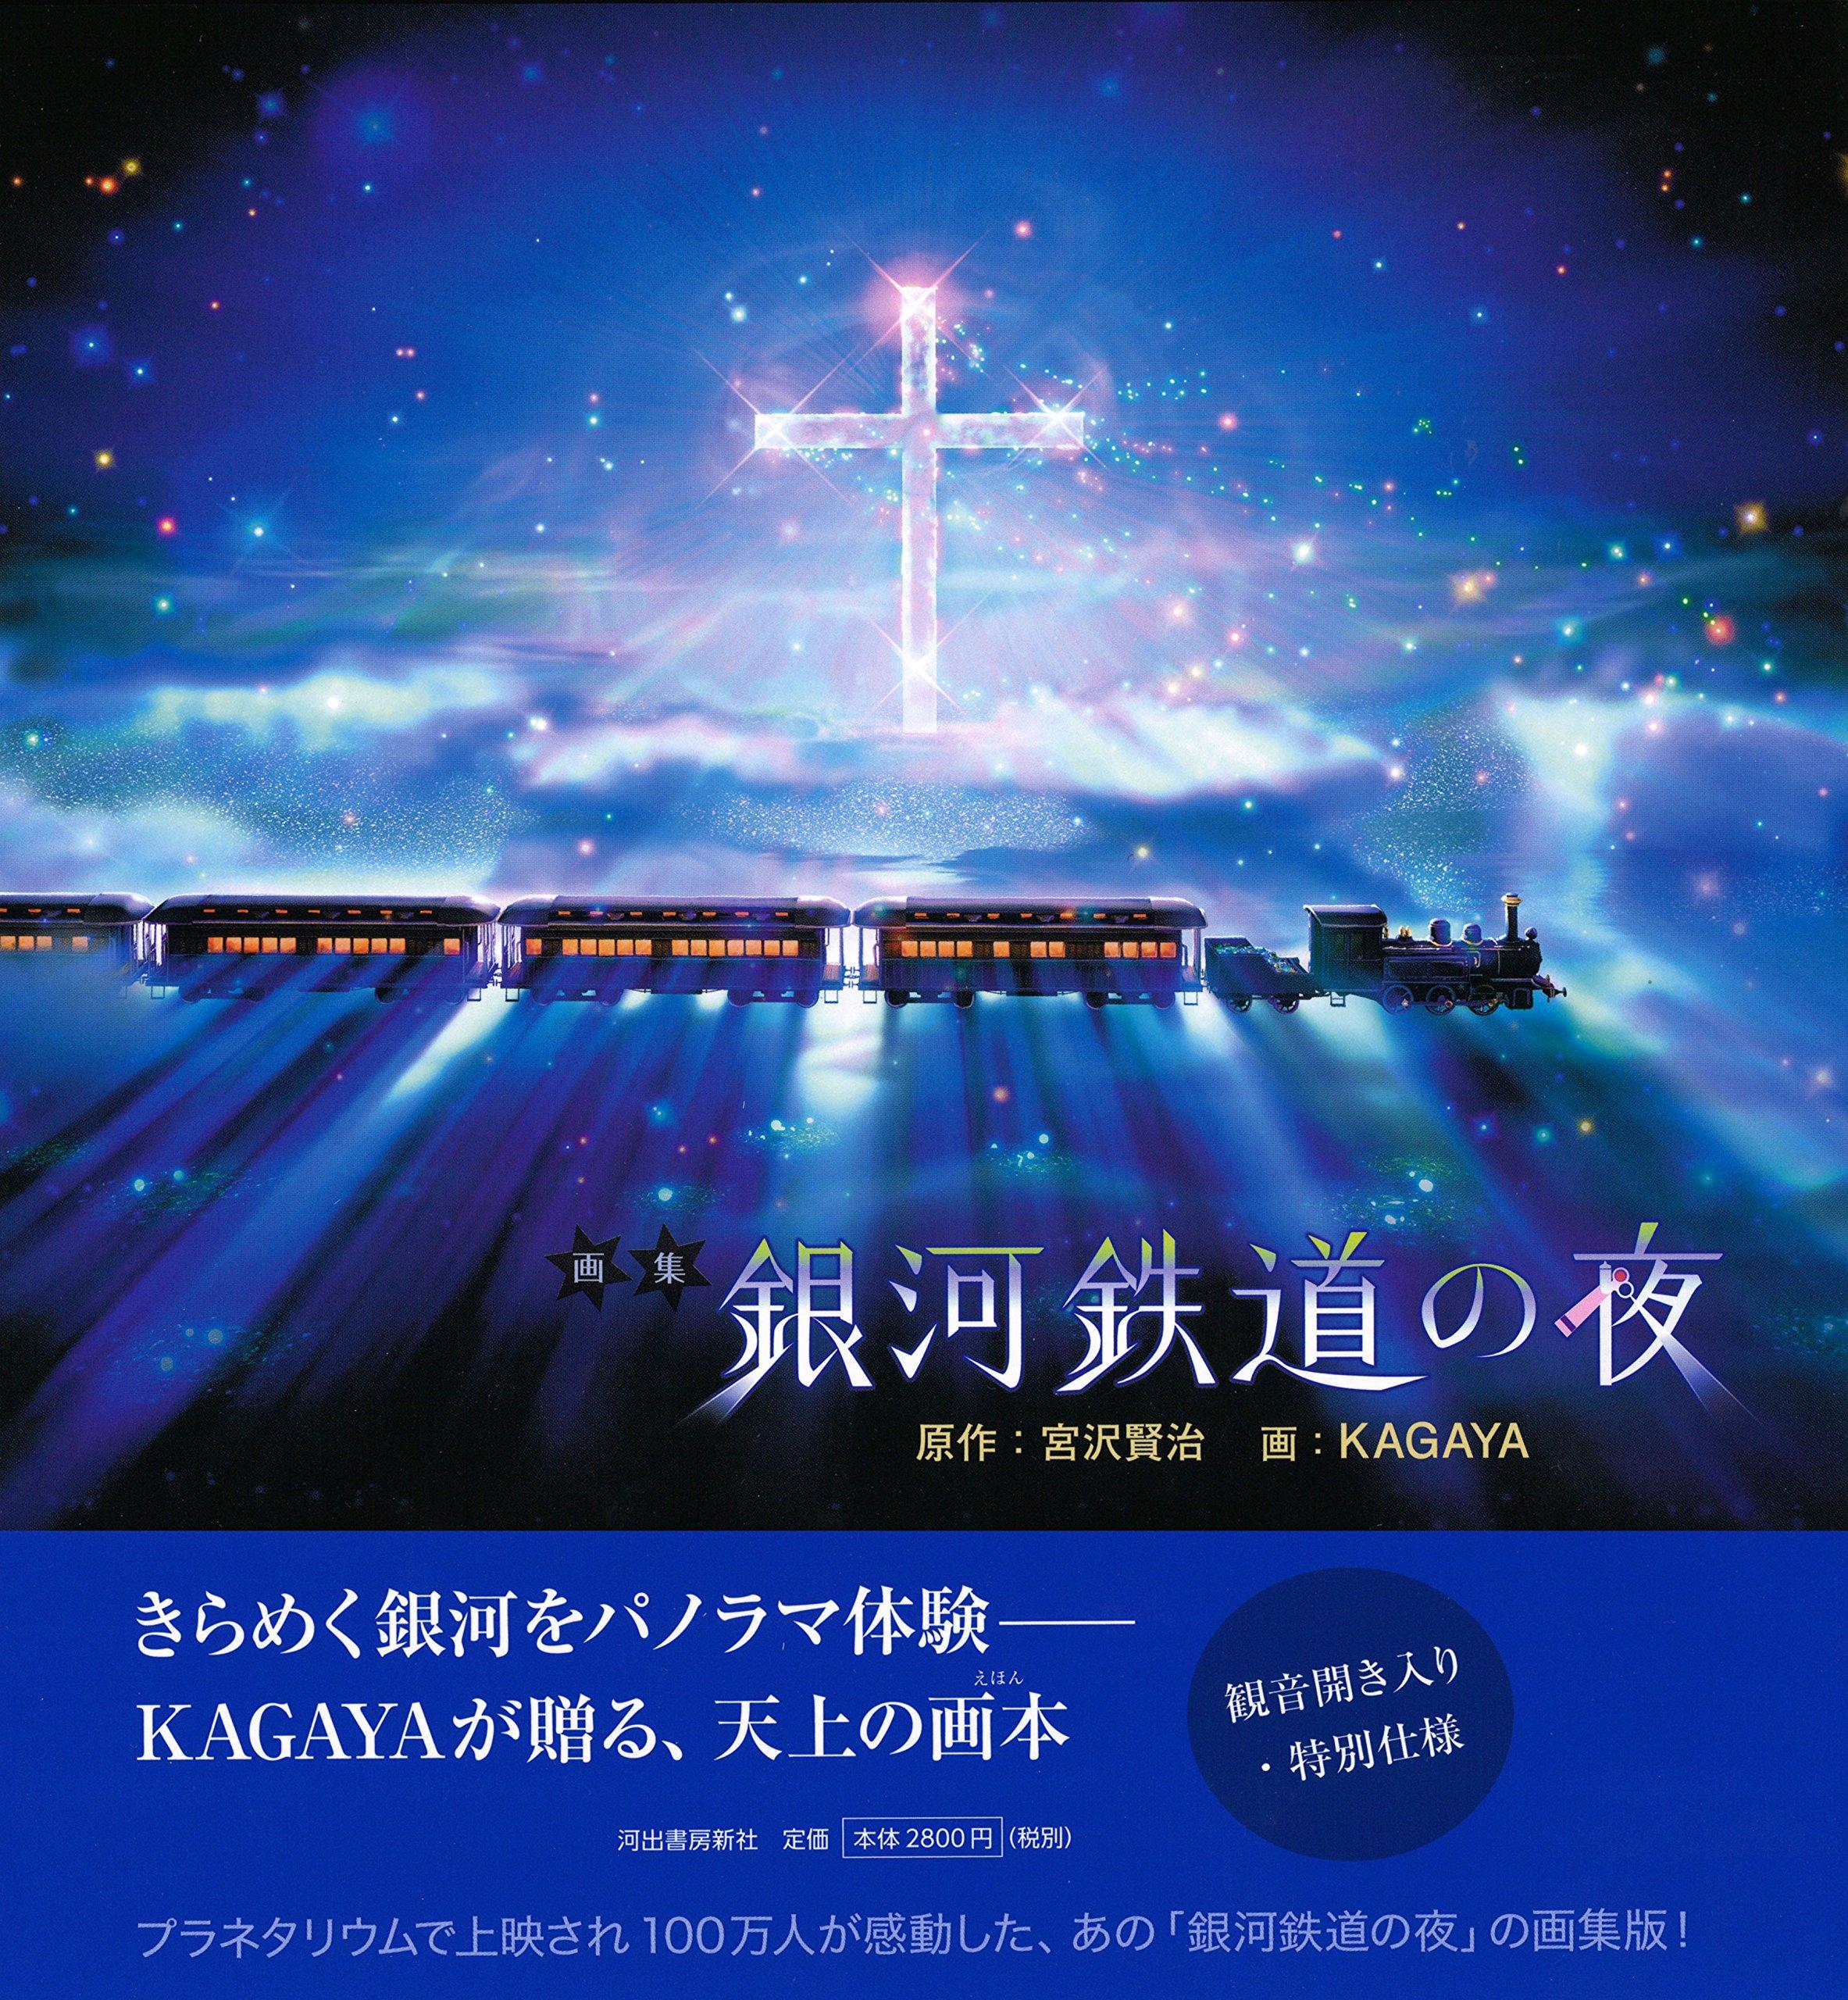 画集 銀河鉄道の夜/KAGAYA